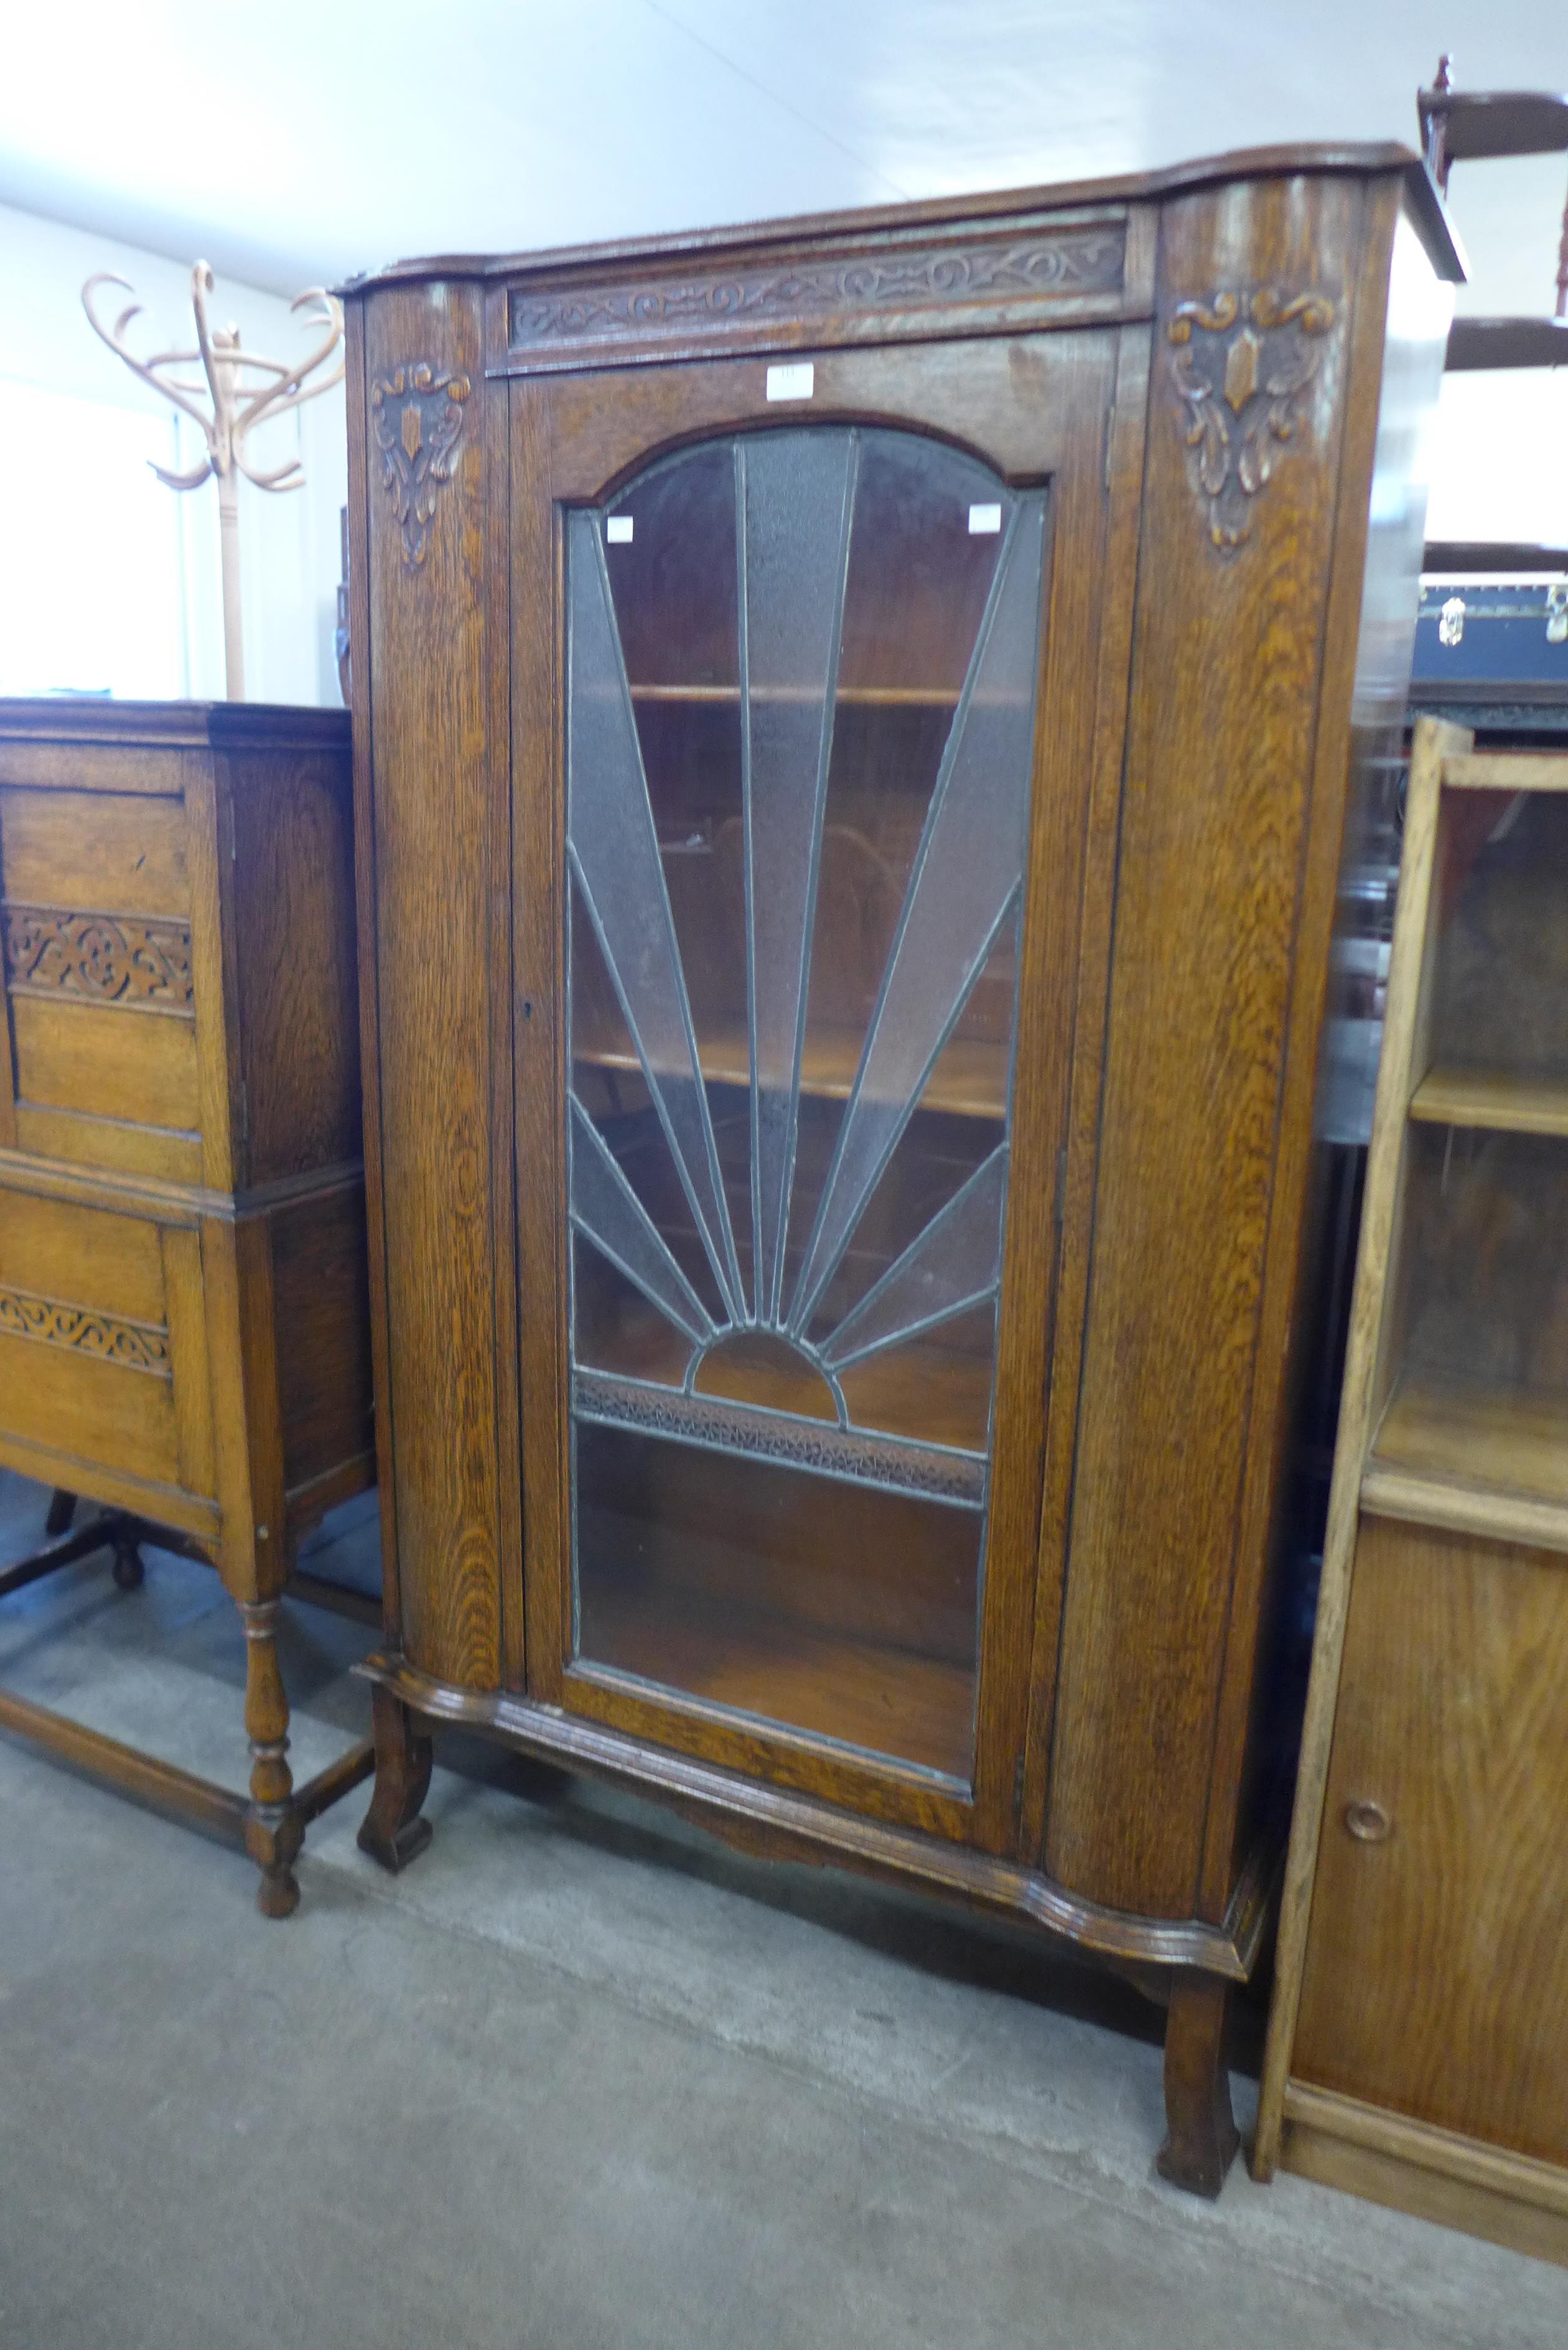 A carved oak bookcase